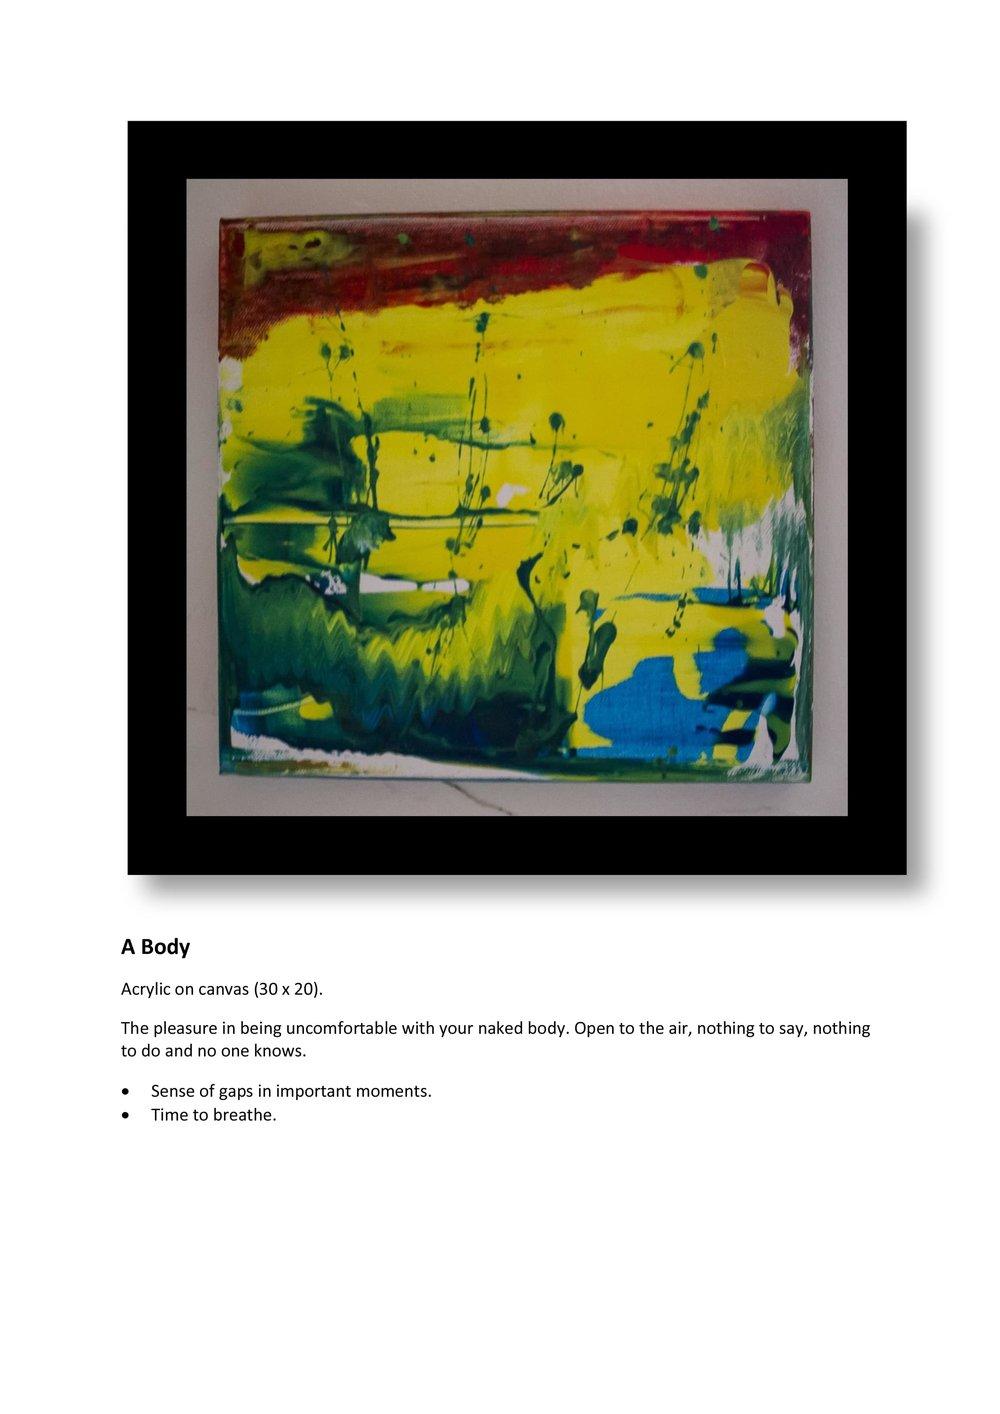 art-portfolio-aglae-corrected-4-min.jpg